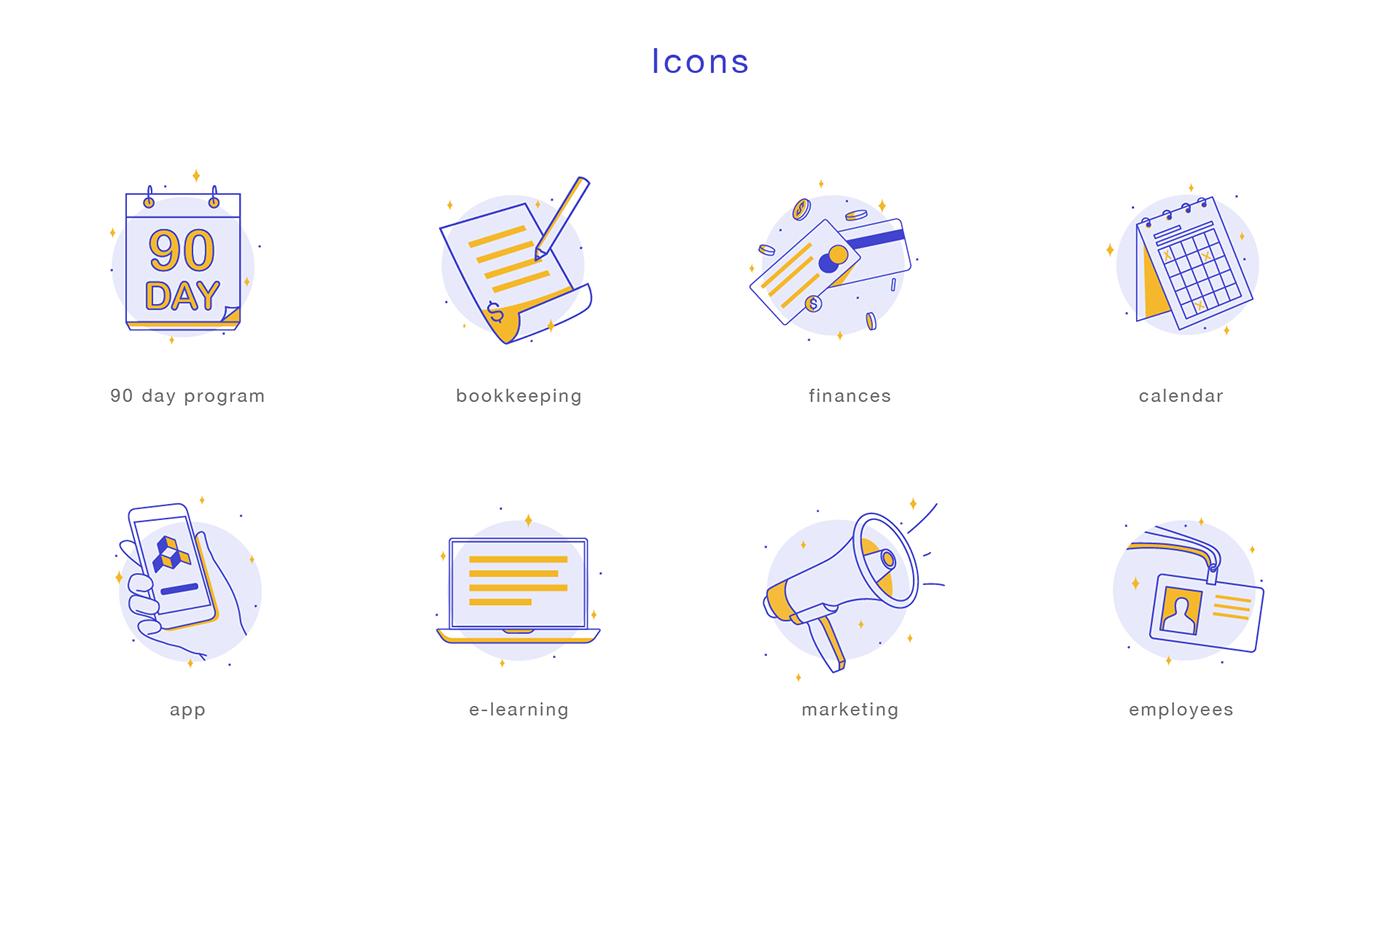 app design UI ux icons iconography illustrations